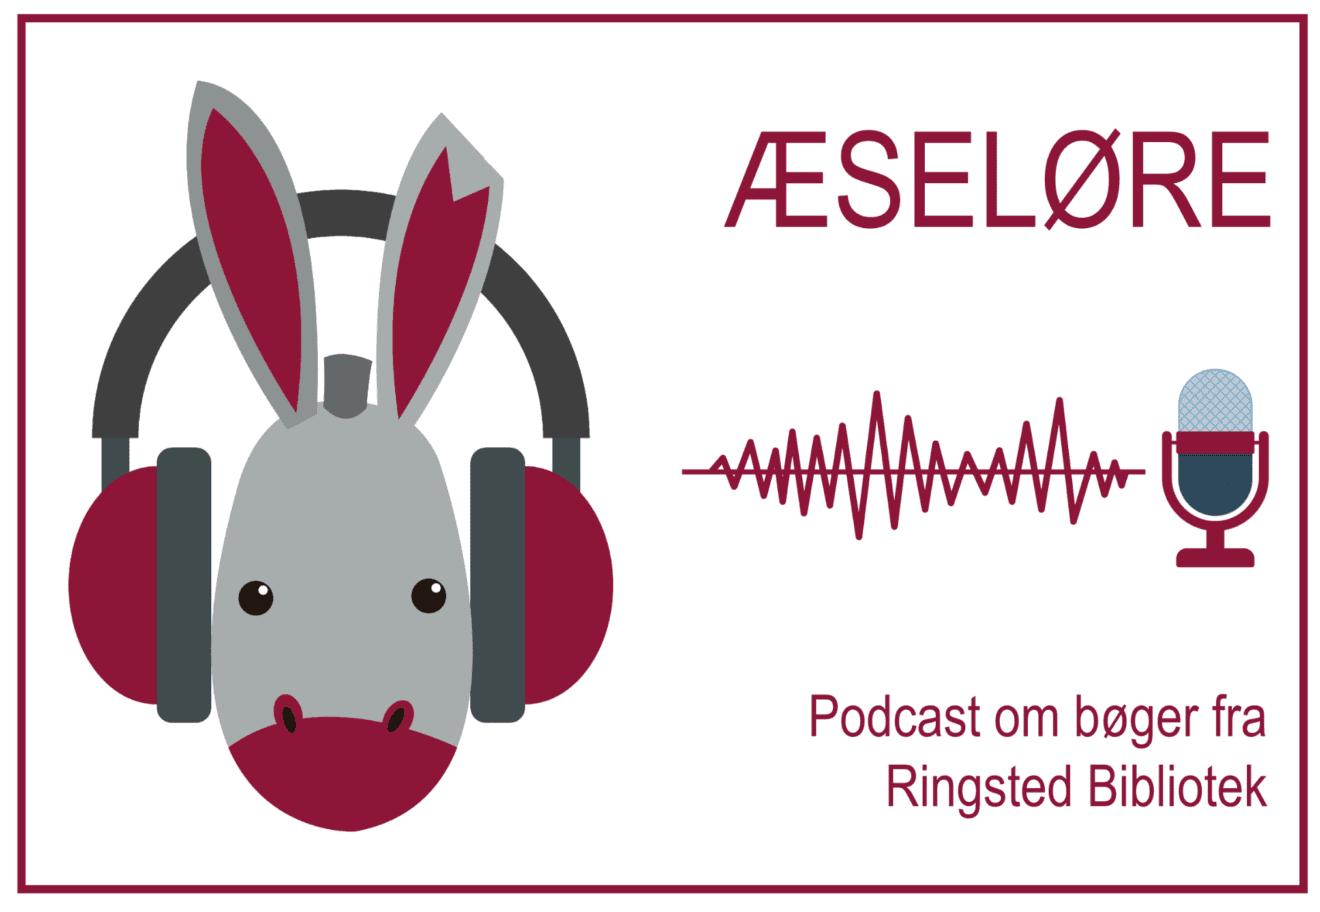 Podcast fra biblioteket